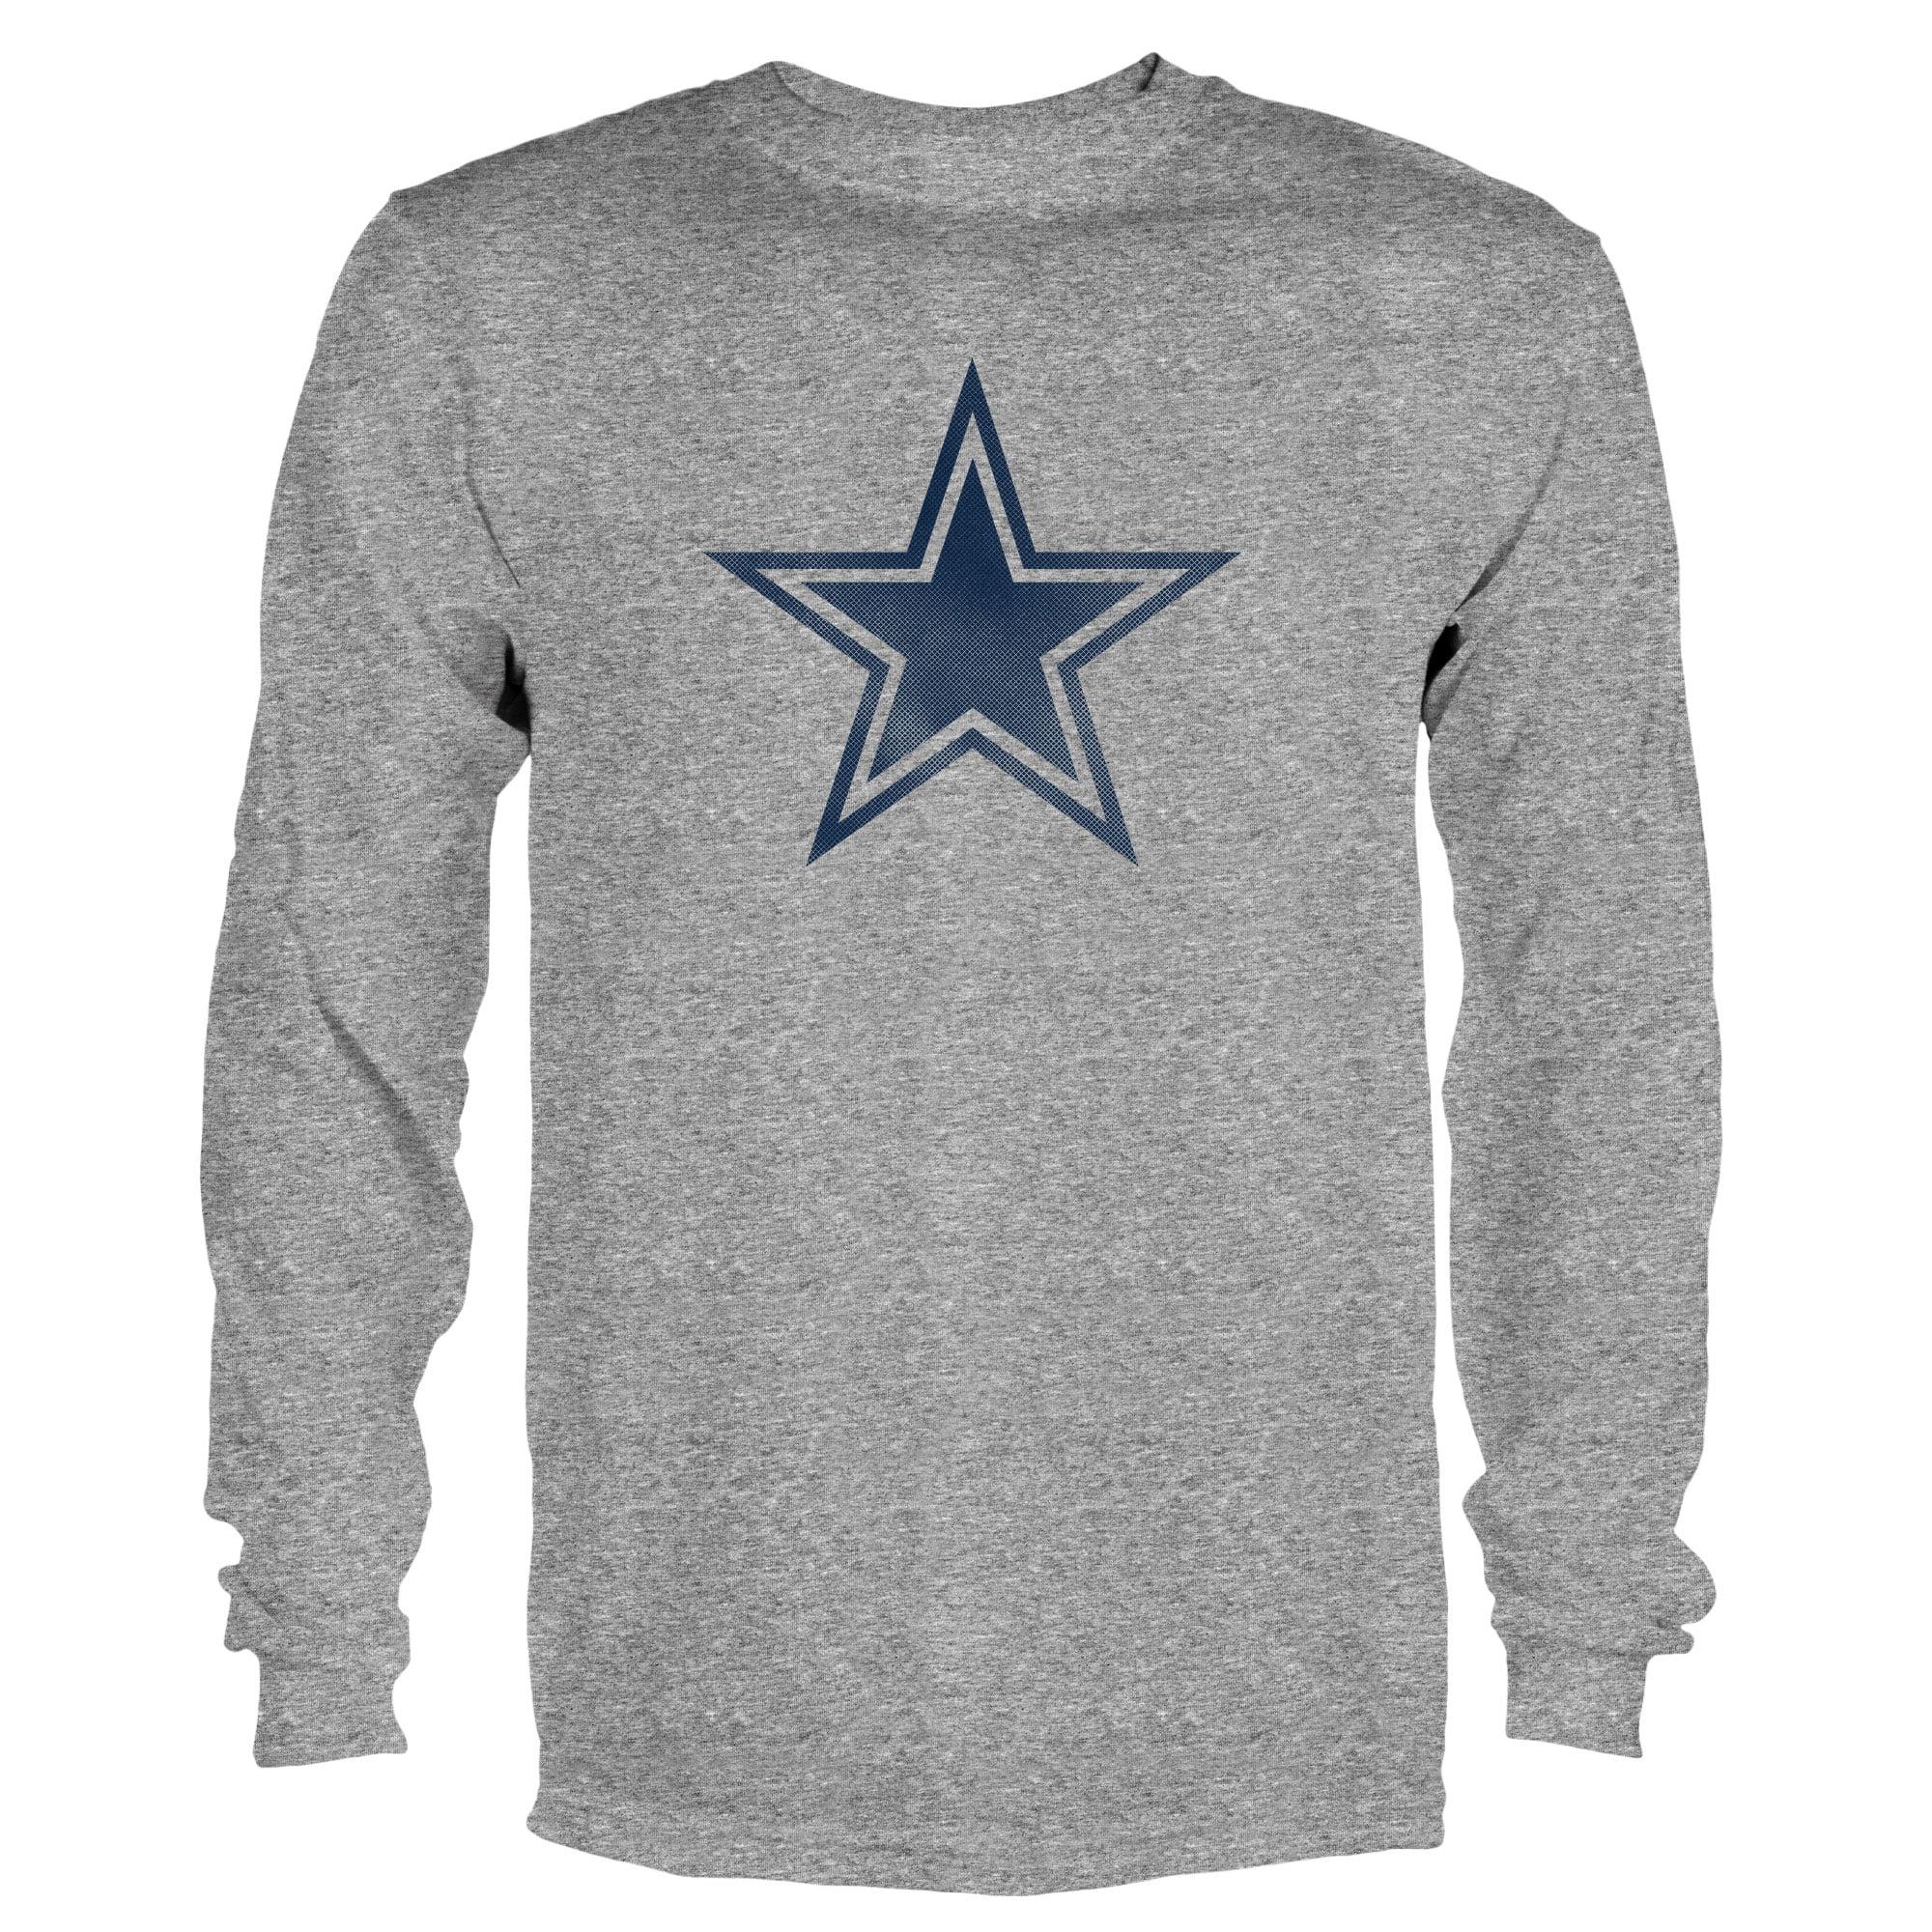 Dallas Cowboys Womens T Shirts Walmart - BCD Tofu House f07947e93